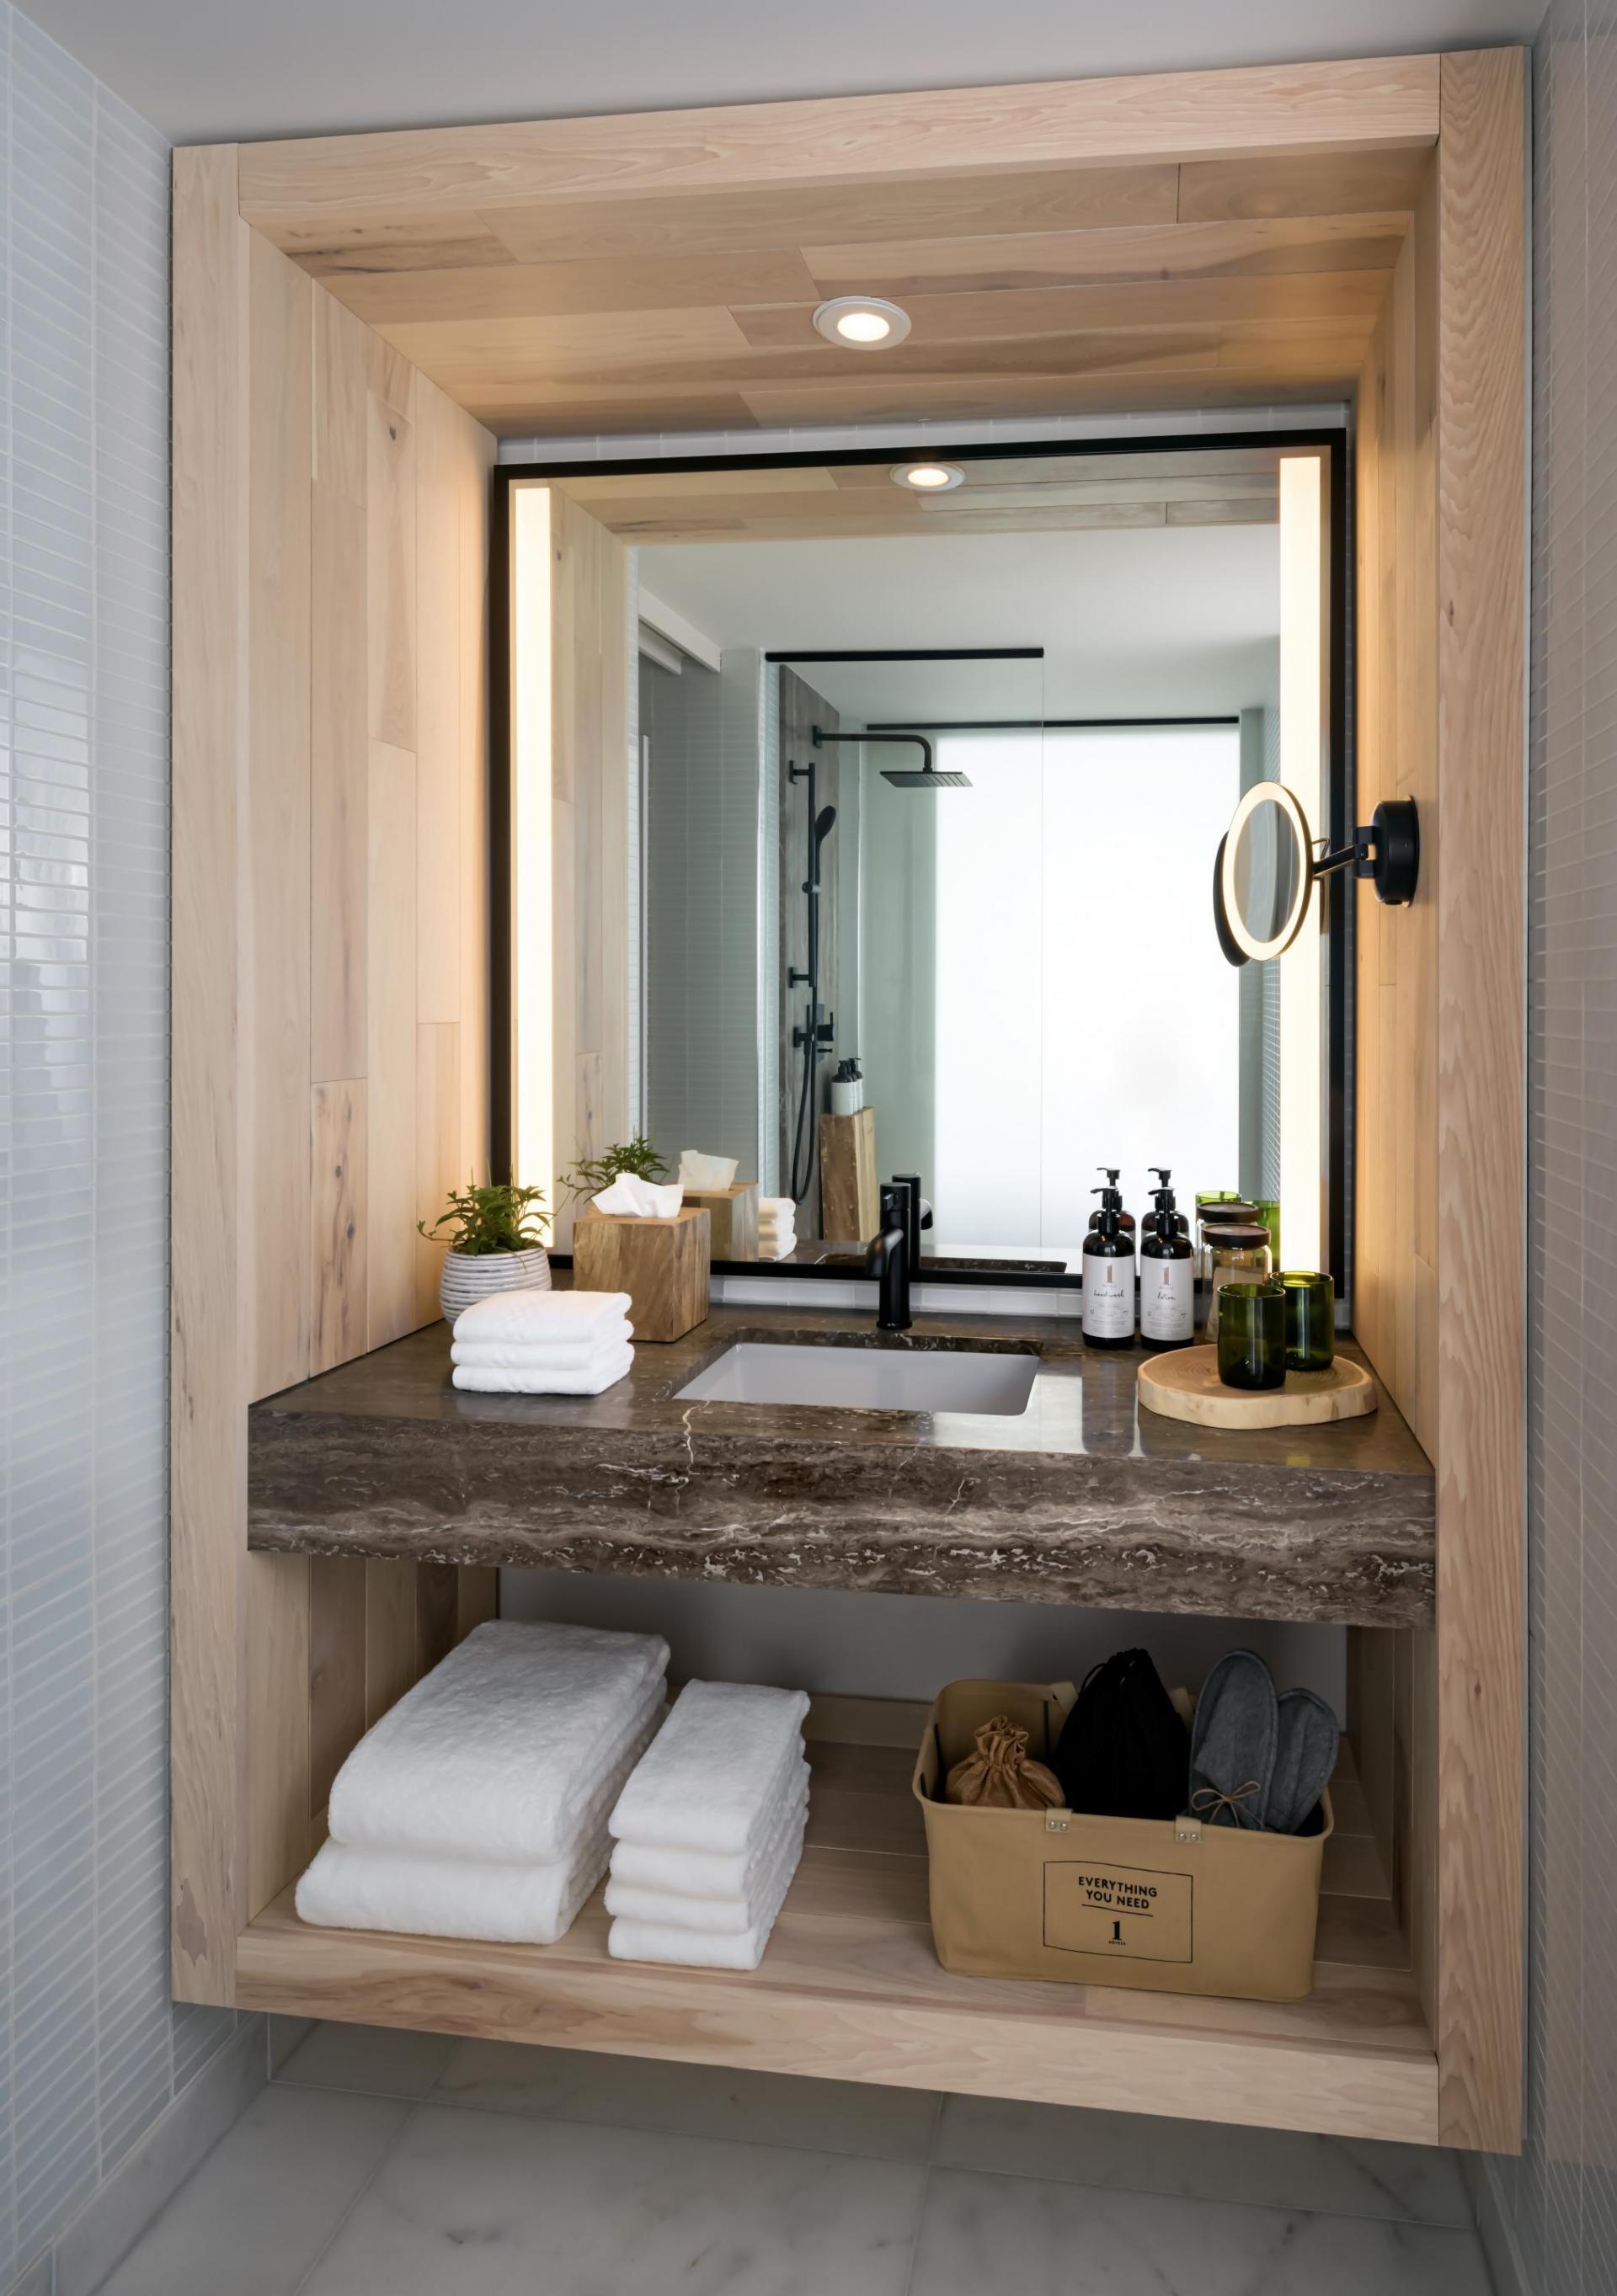 1 Hotel Toronto Bathroom